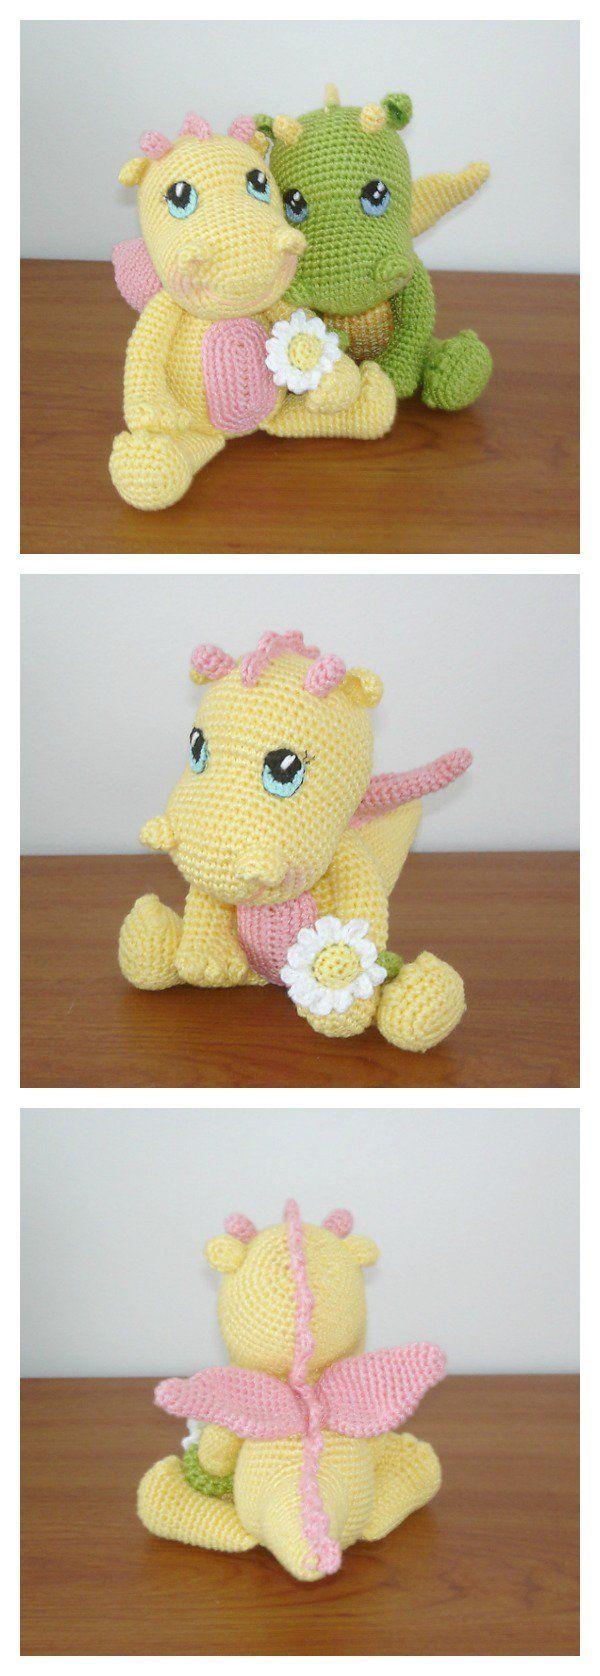 Crochet Amigurumi Dinosaur Free Patterns | Pinterest | Dinosaurier ...